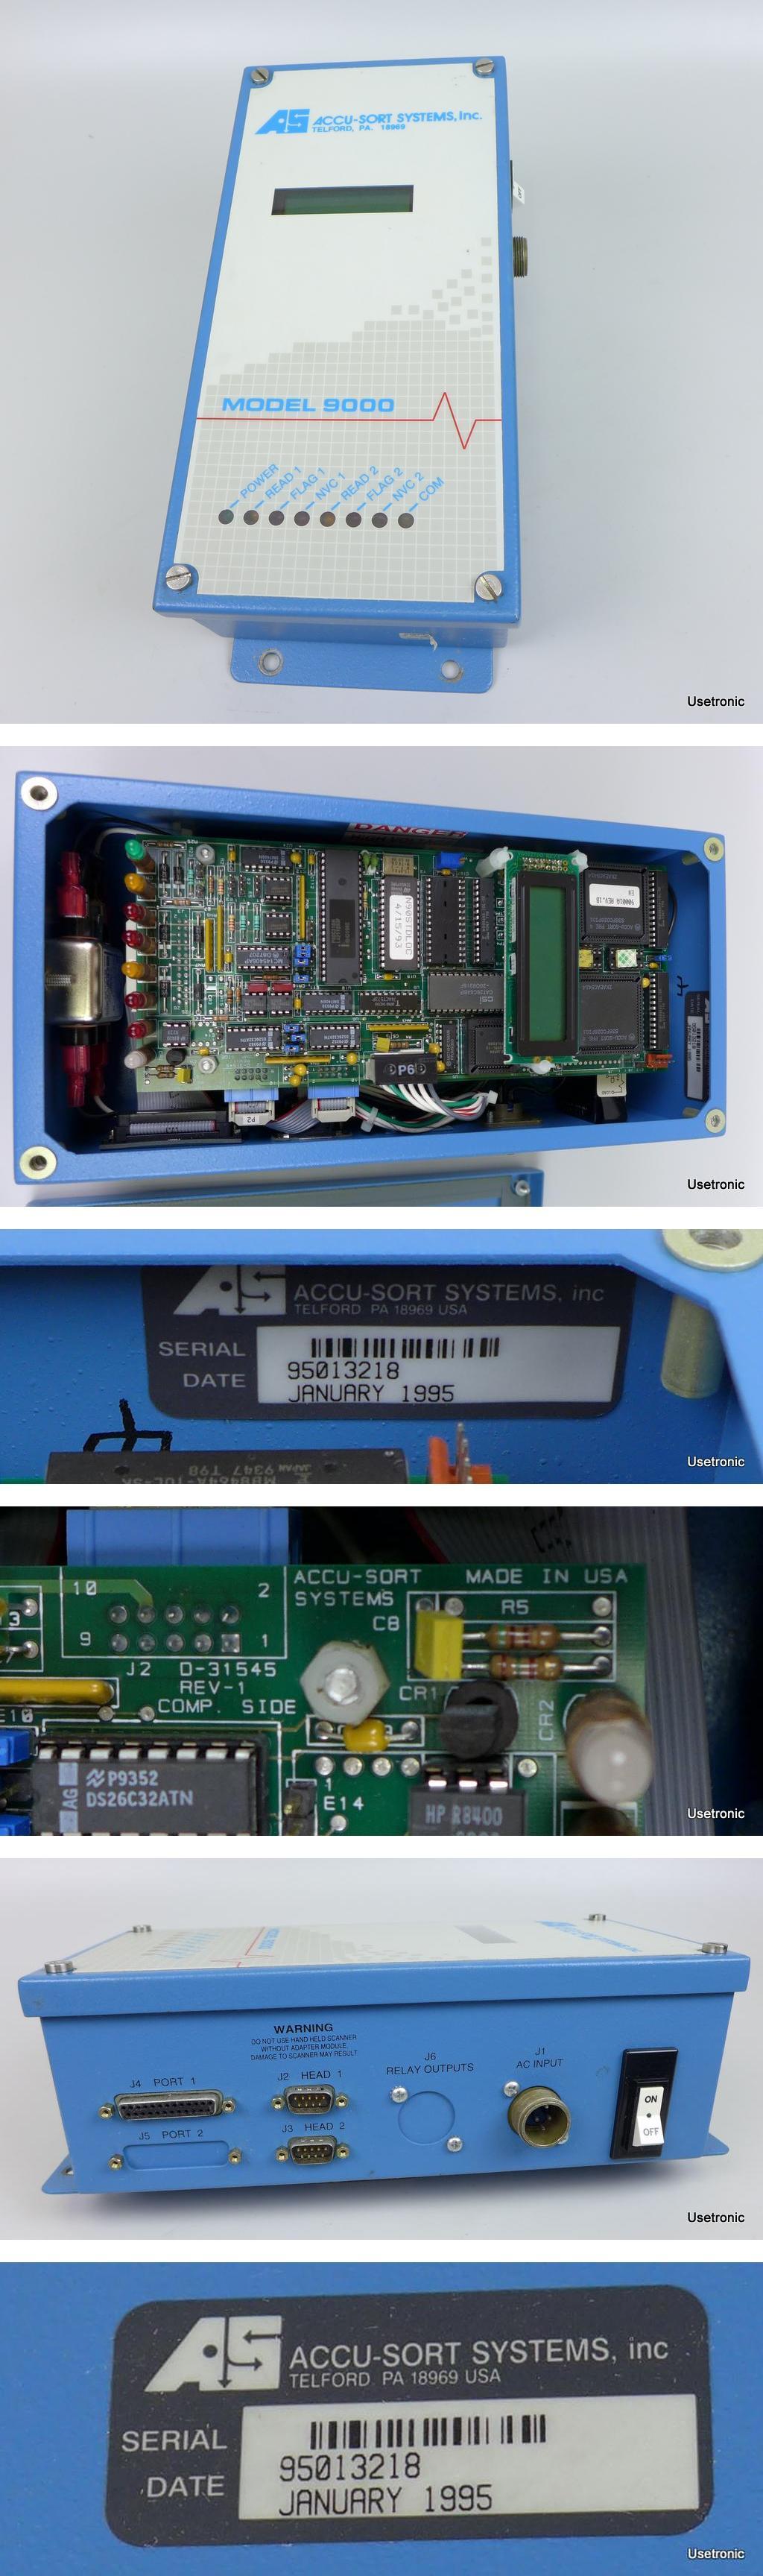 Accu Sort Modell 9000